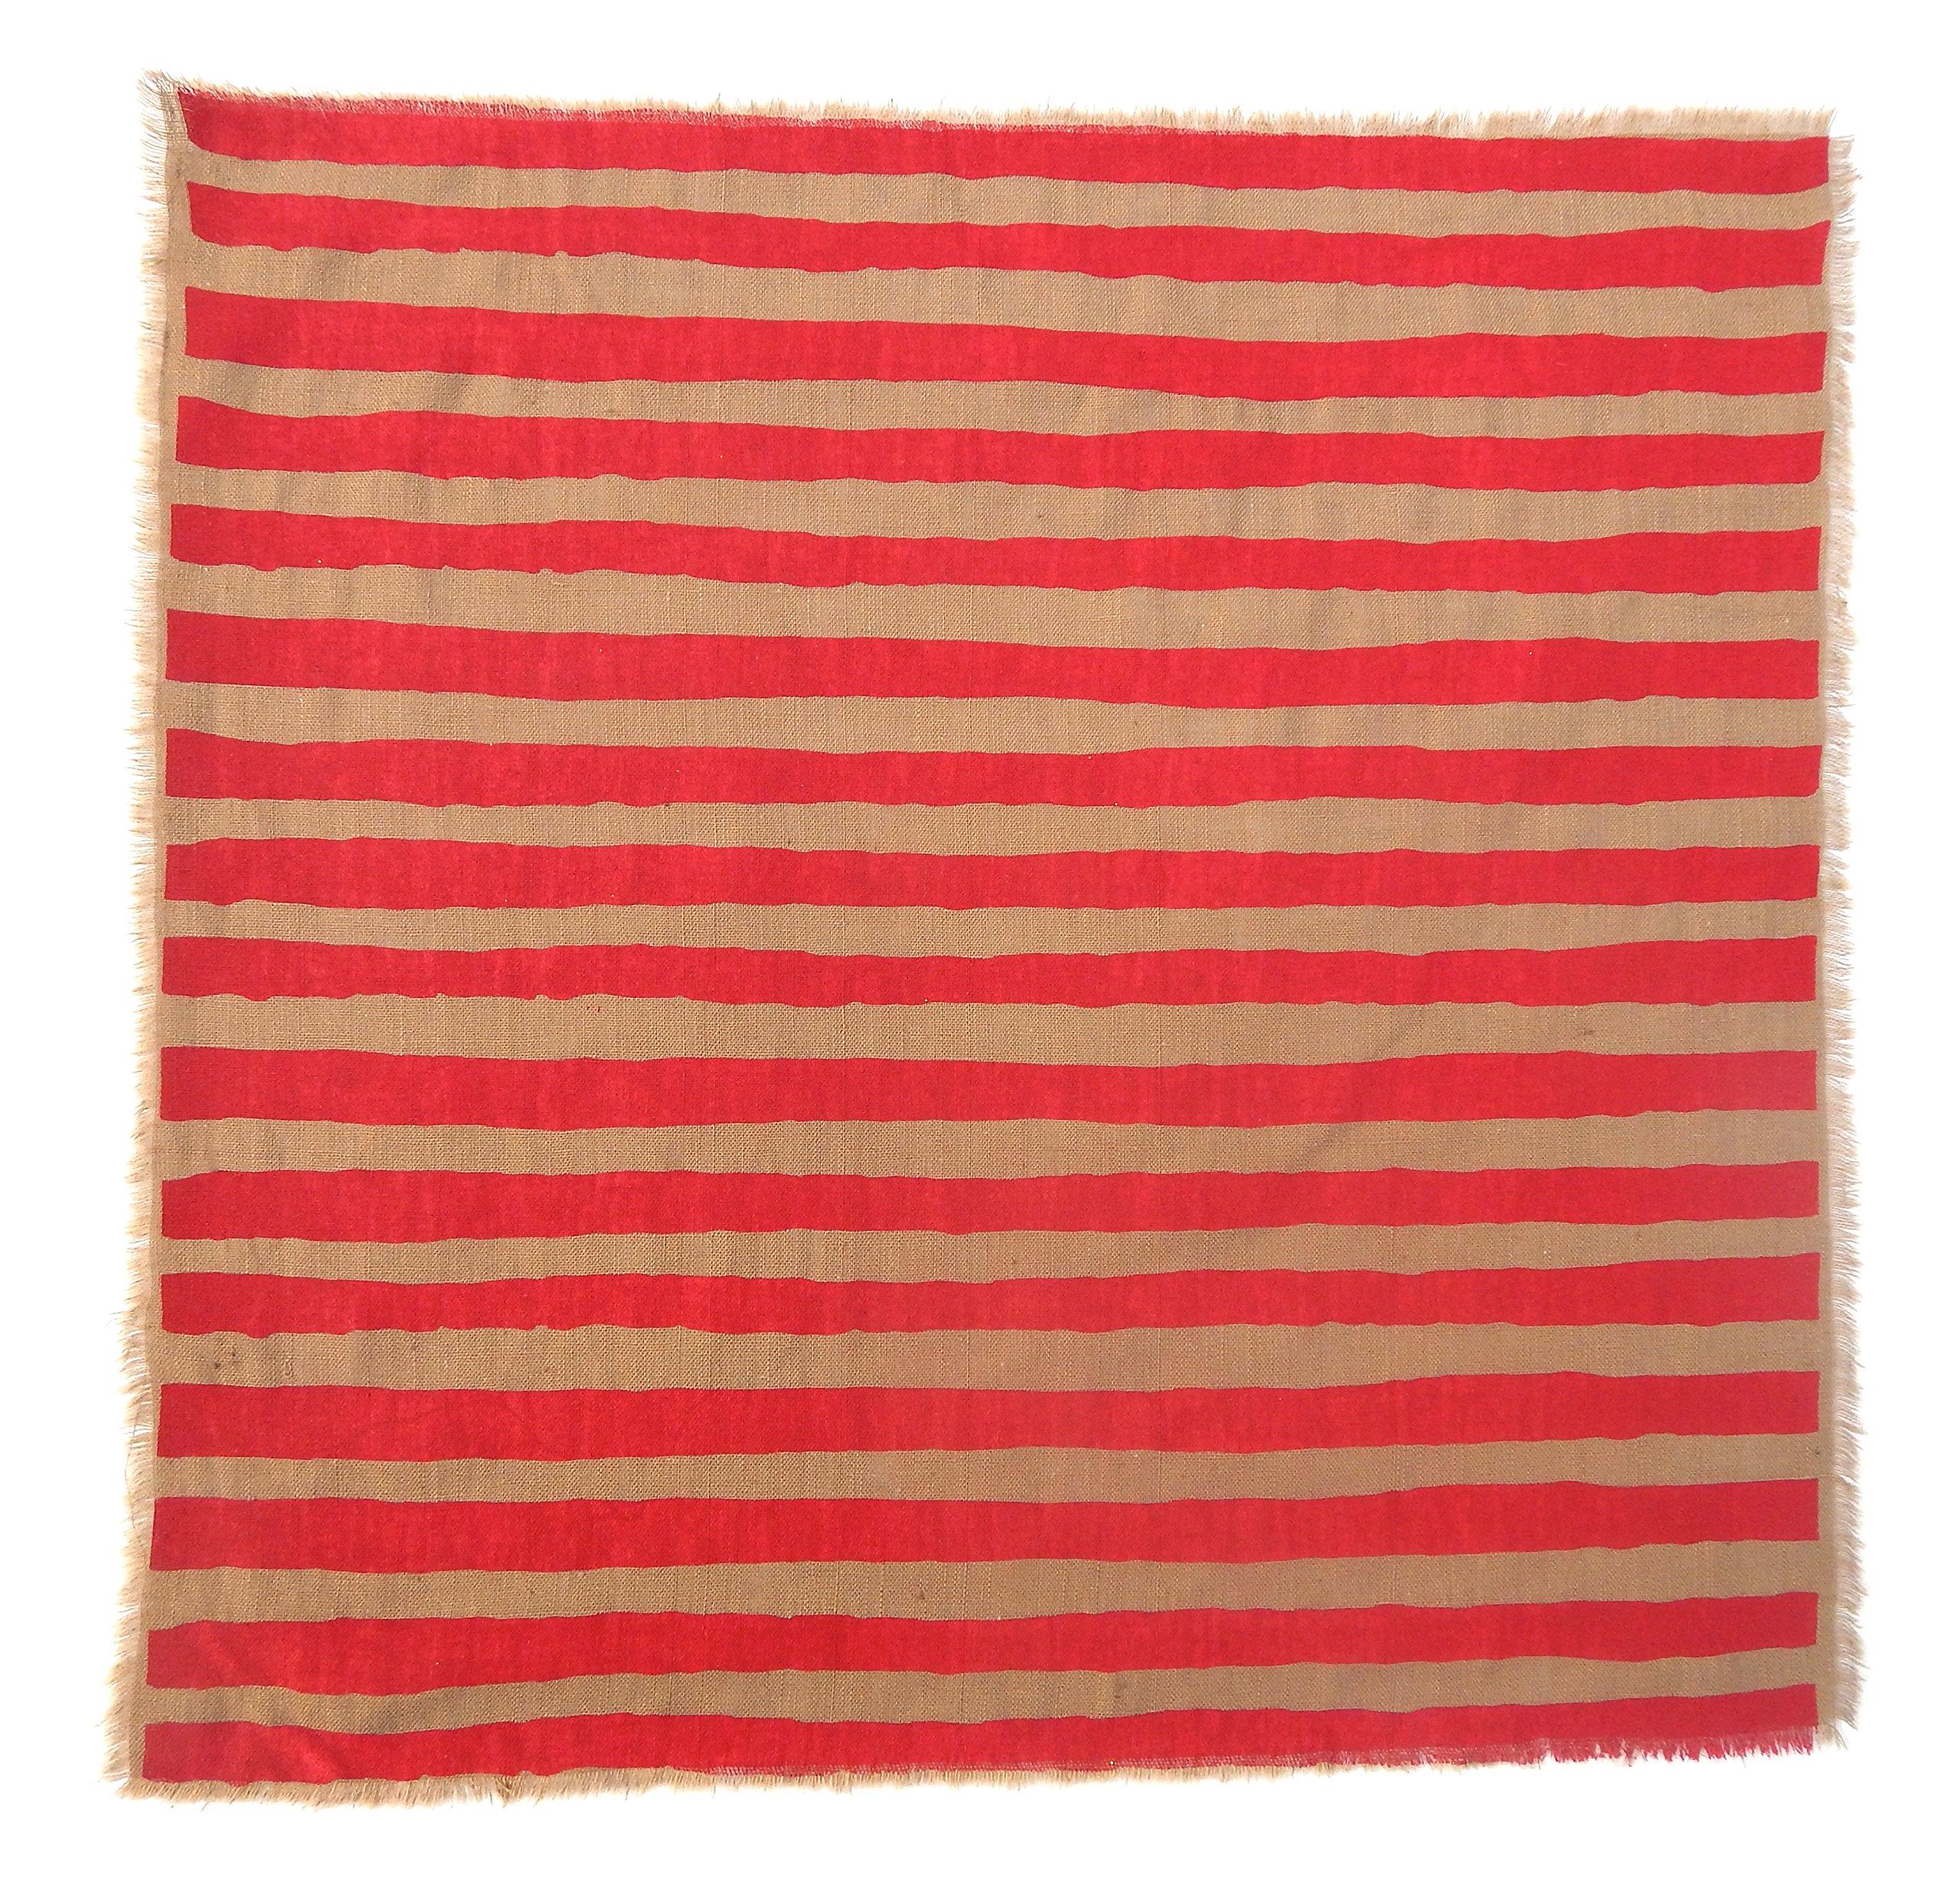 Gitika Goyal Home Windows Collection Cotton Khadi  Khaki Napkin 17x17 Stripe Design, Red Hand Screen Print